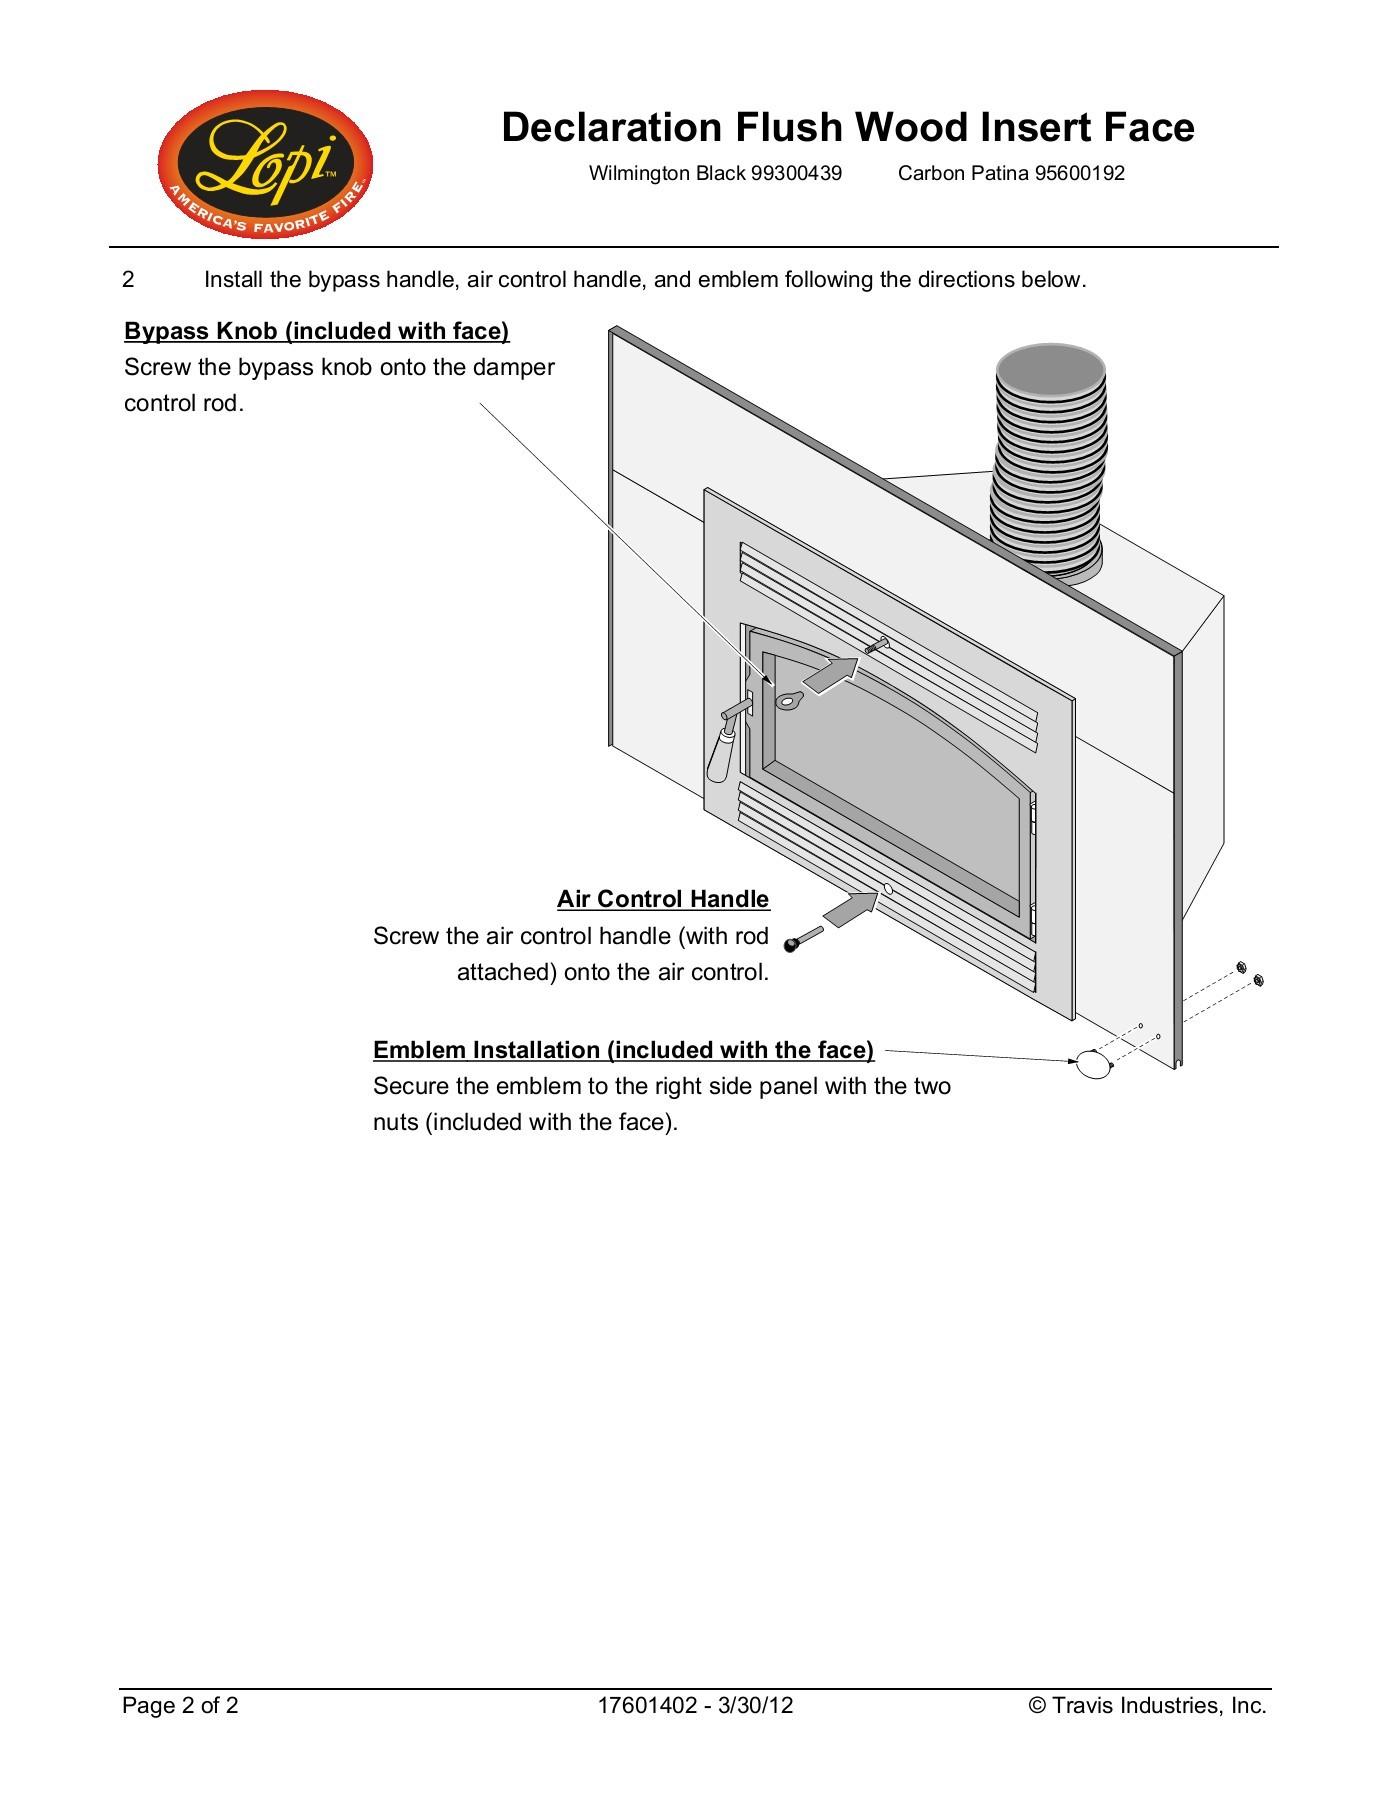 hight resolution of declaration flush wood insert face offical site avalon